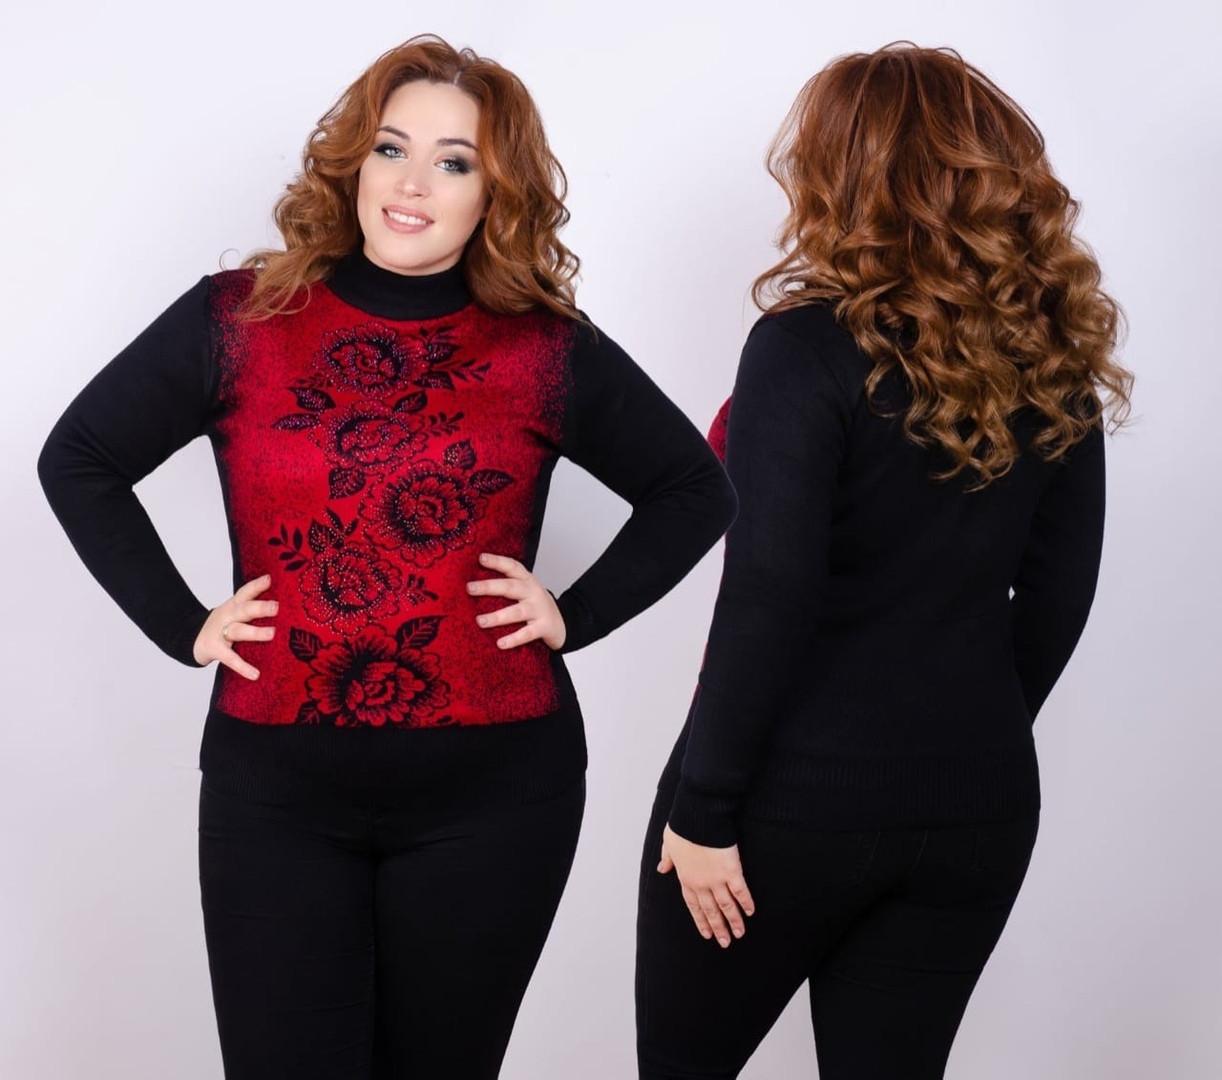 Супер тёплый свитер из трикотажа на меху 48-52 размер